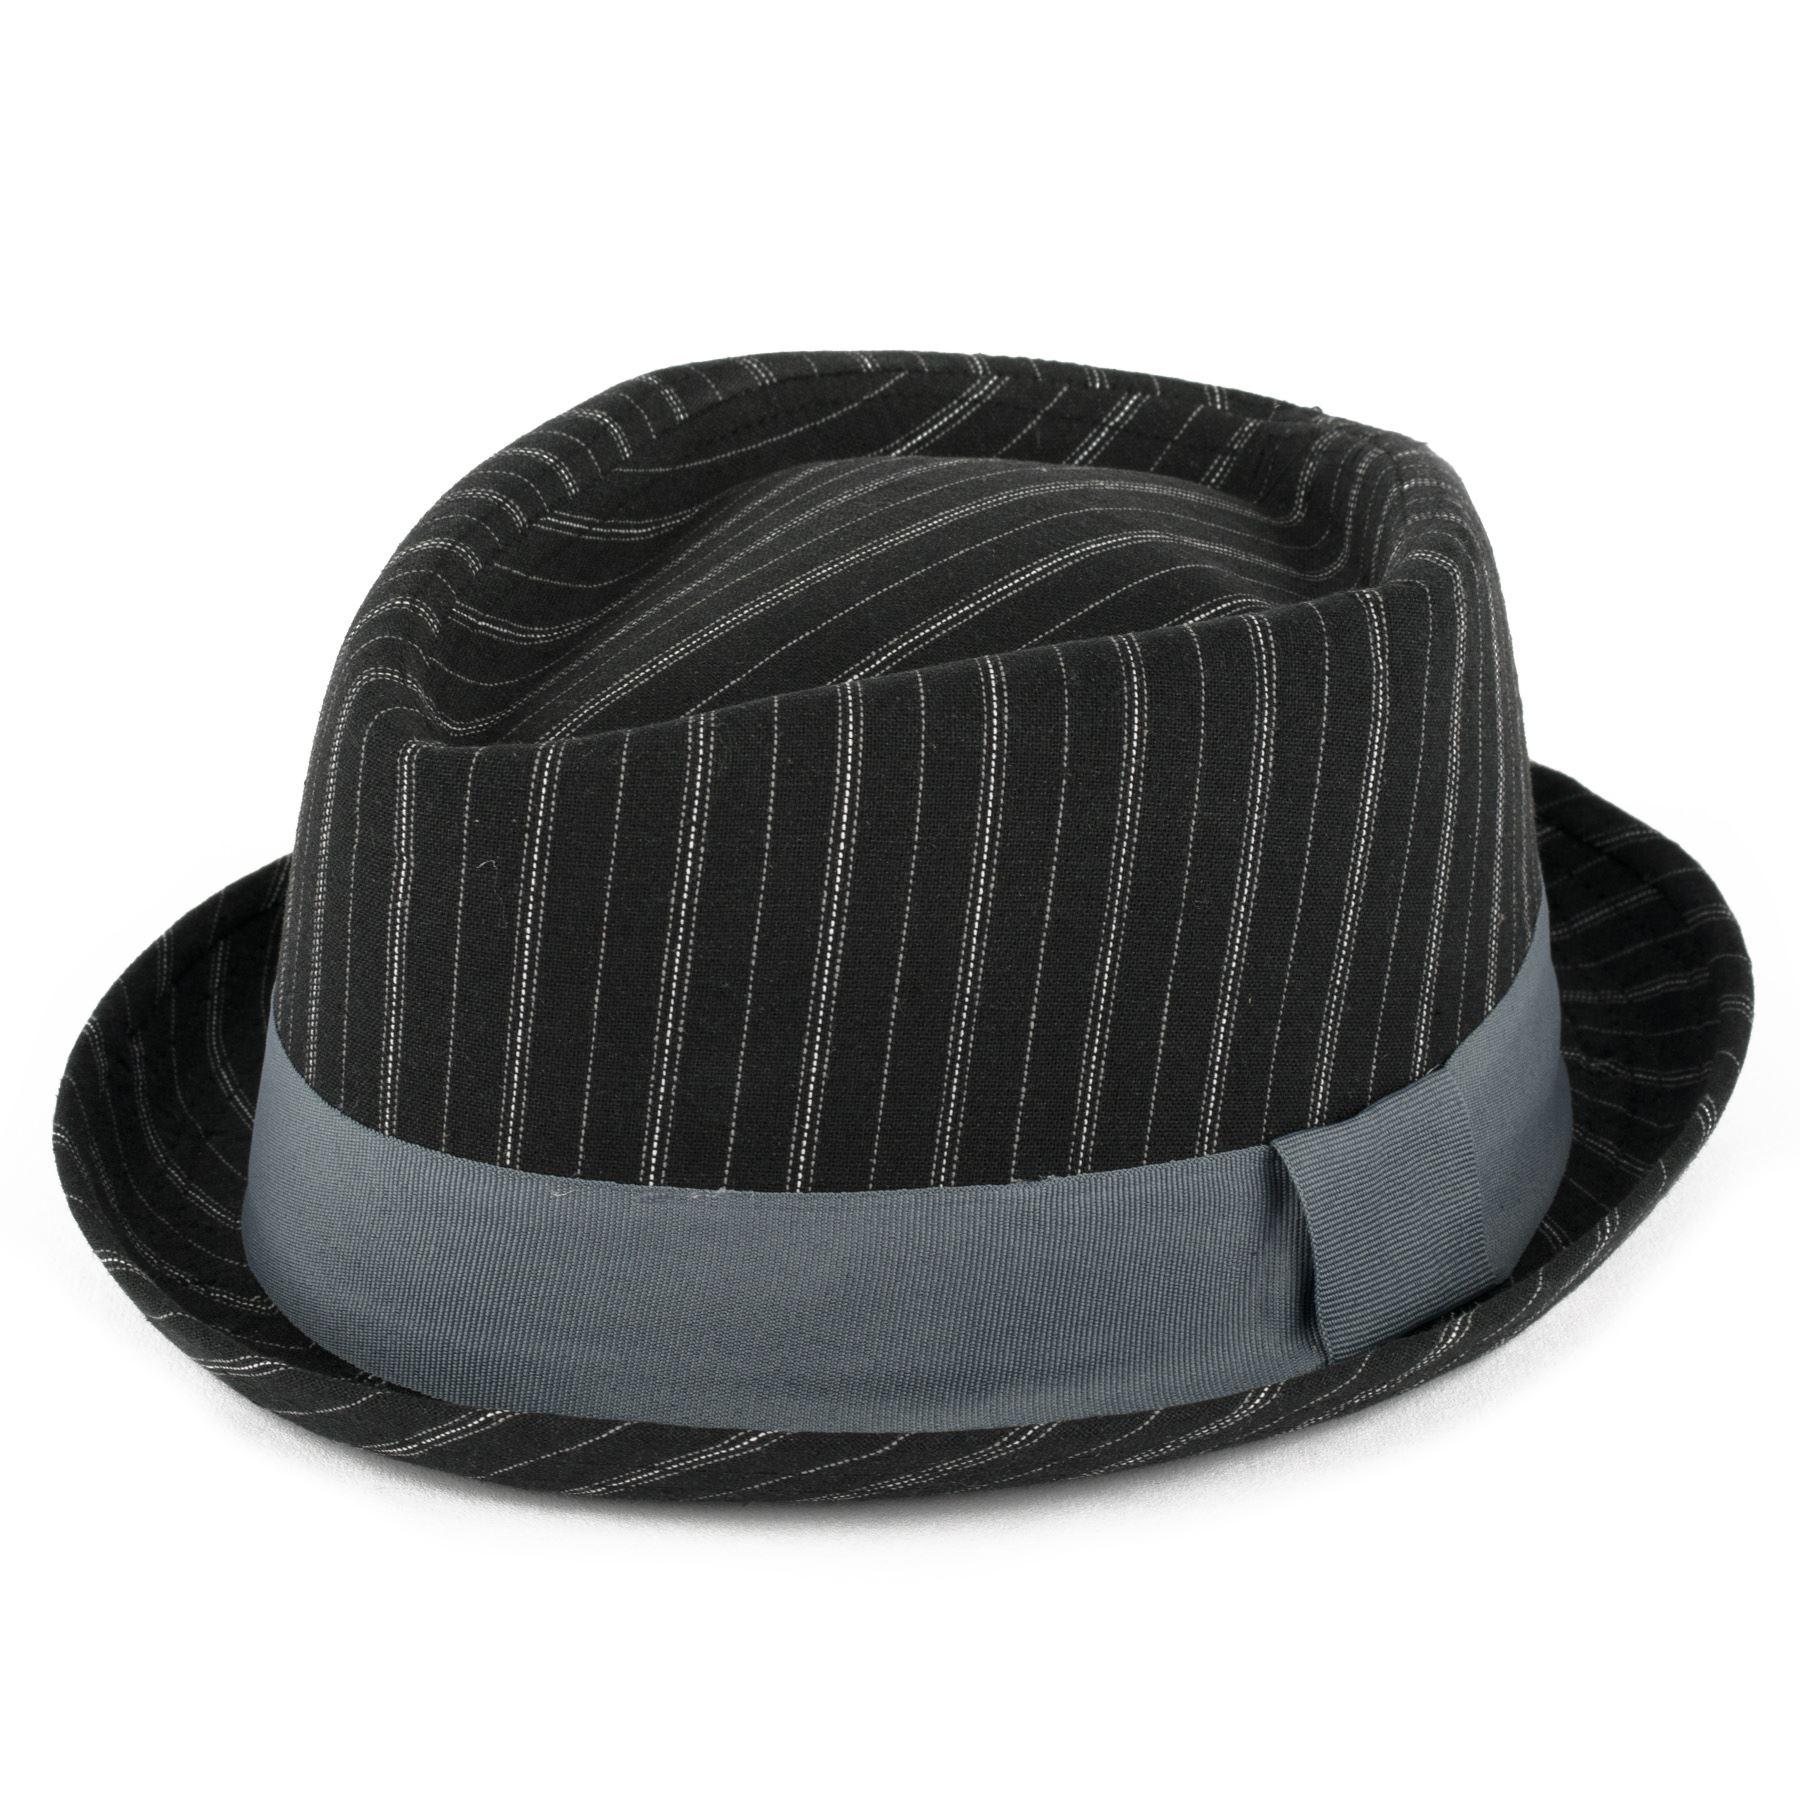 041c33912fd Diamond Shaped Pinstriped Summer Pork Pie Hat Black 59 Cm